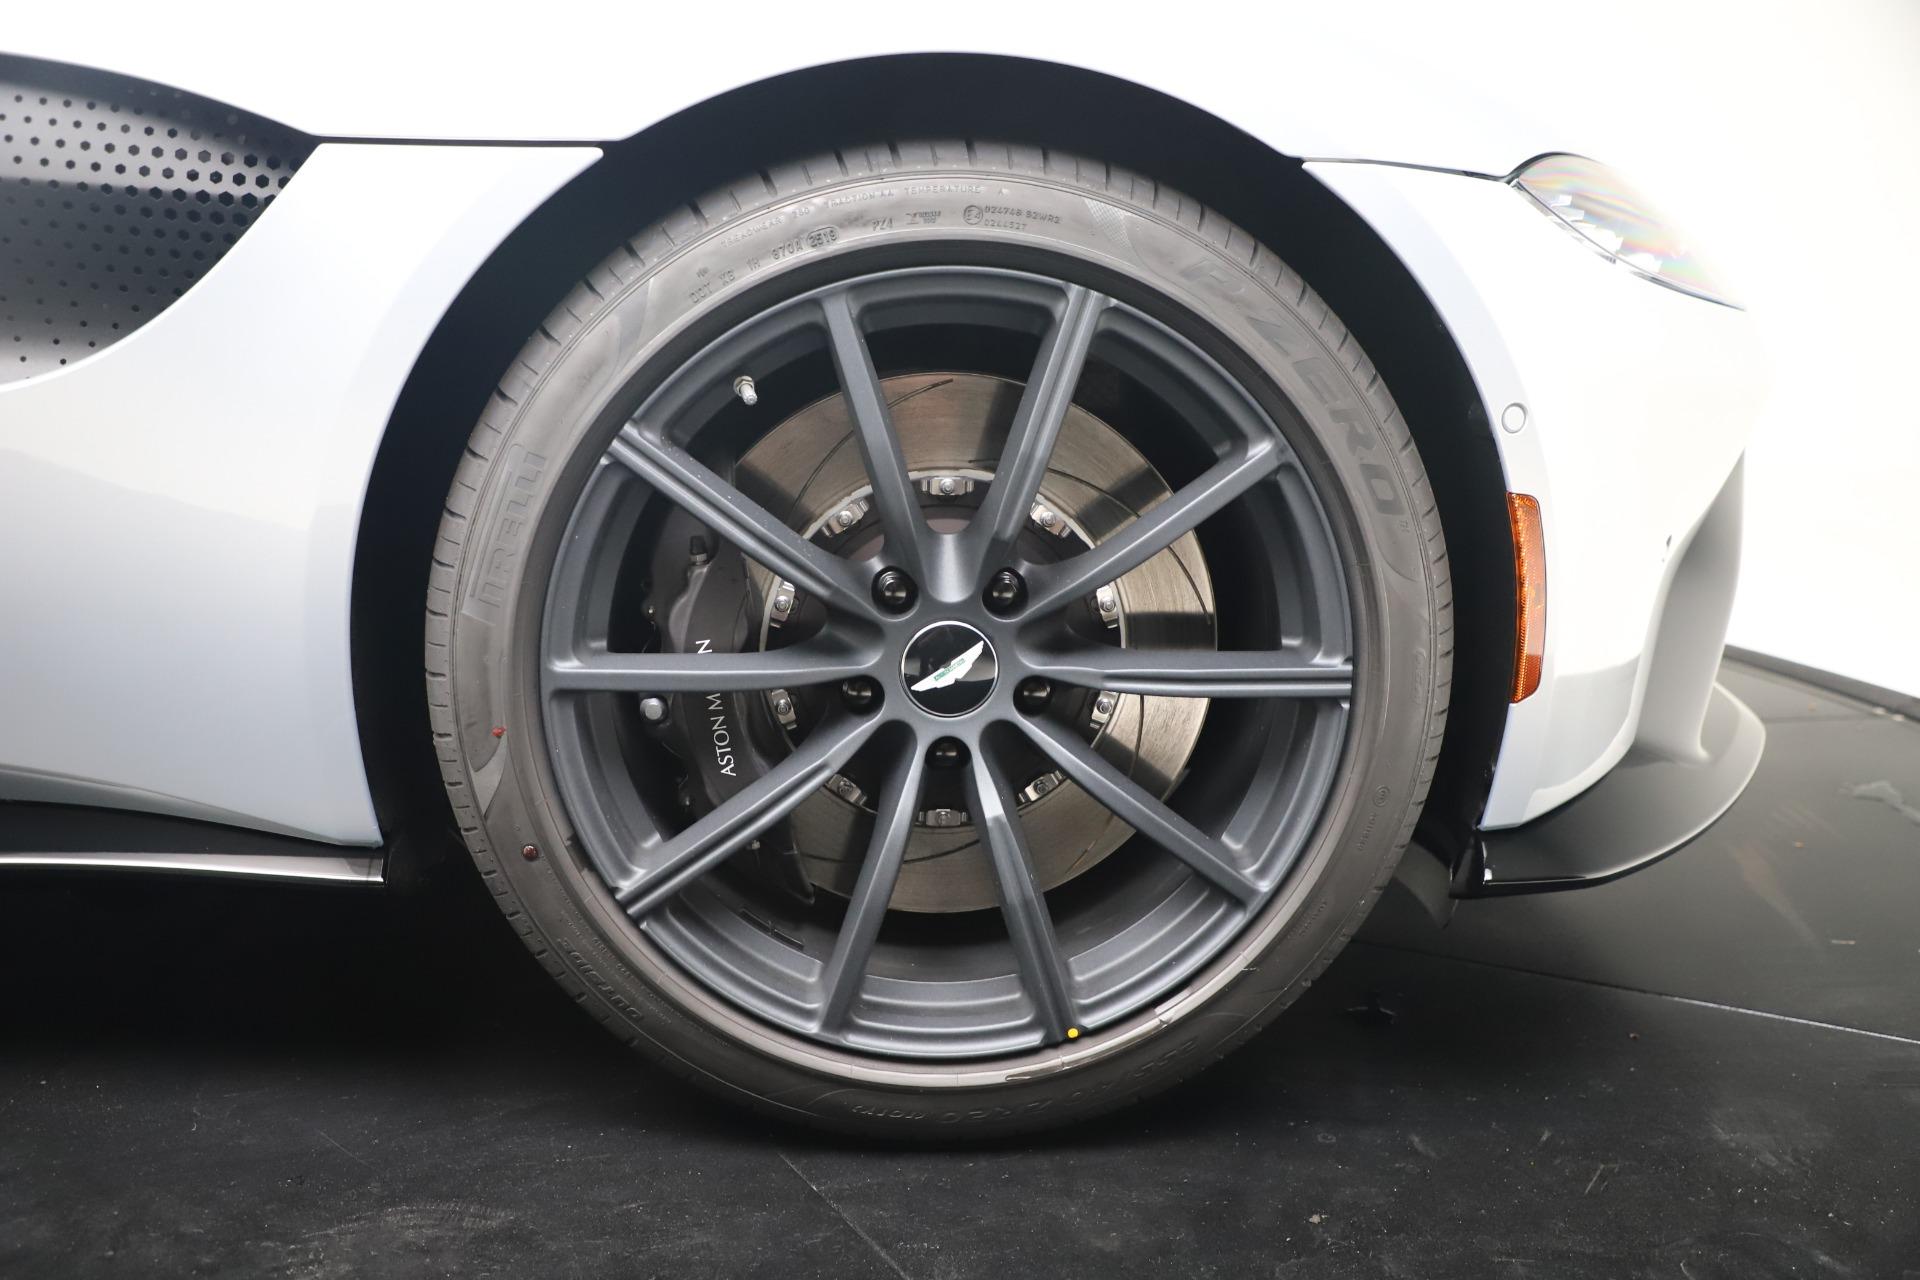 New 2020 Aston Martin Vantage V8 For Sale In Westport, CT 3481_p42